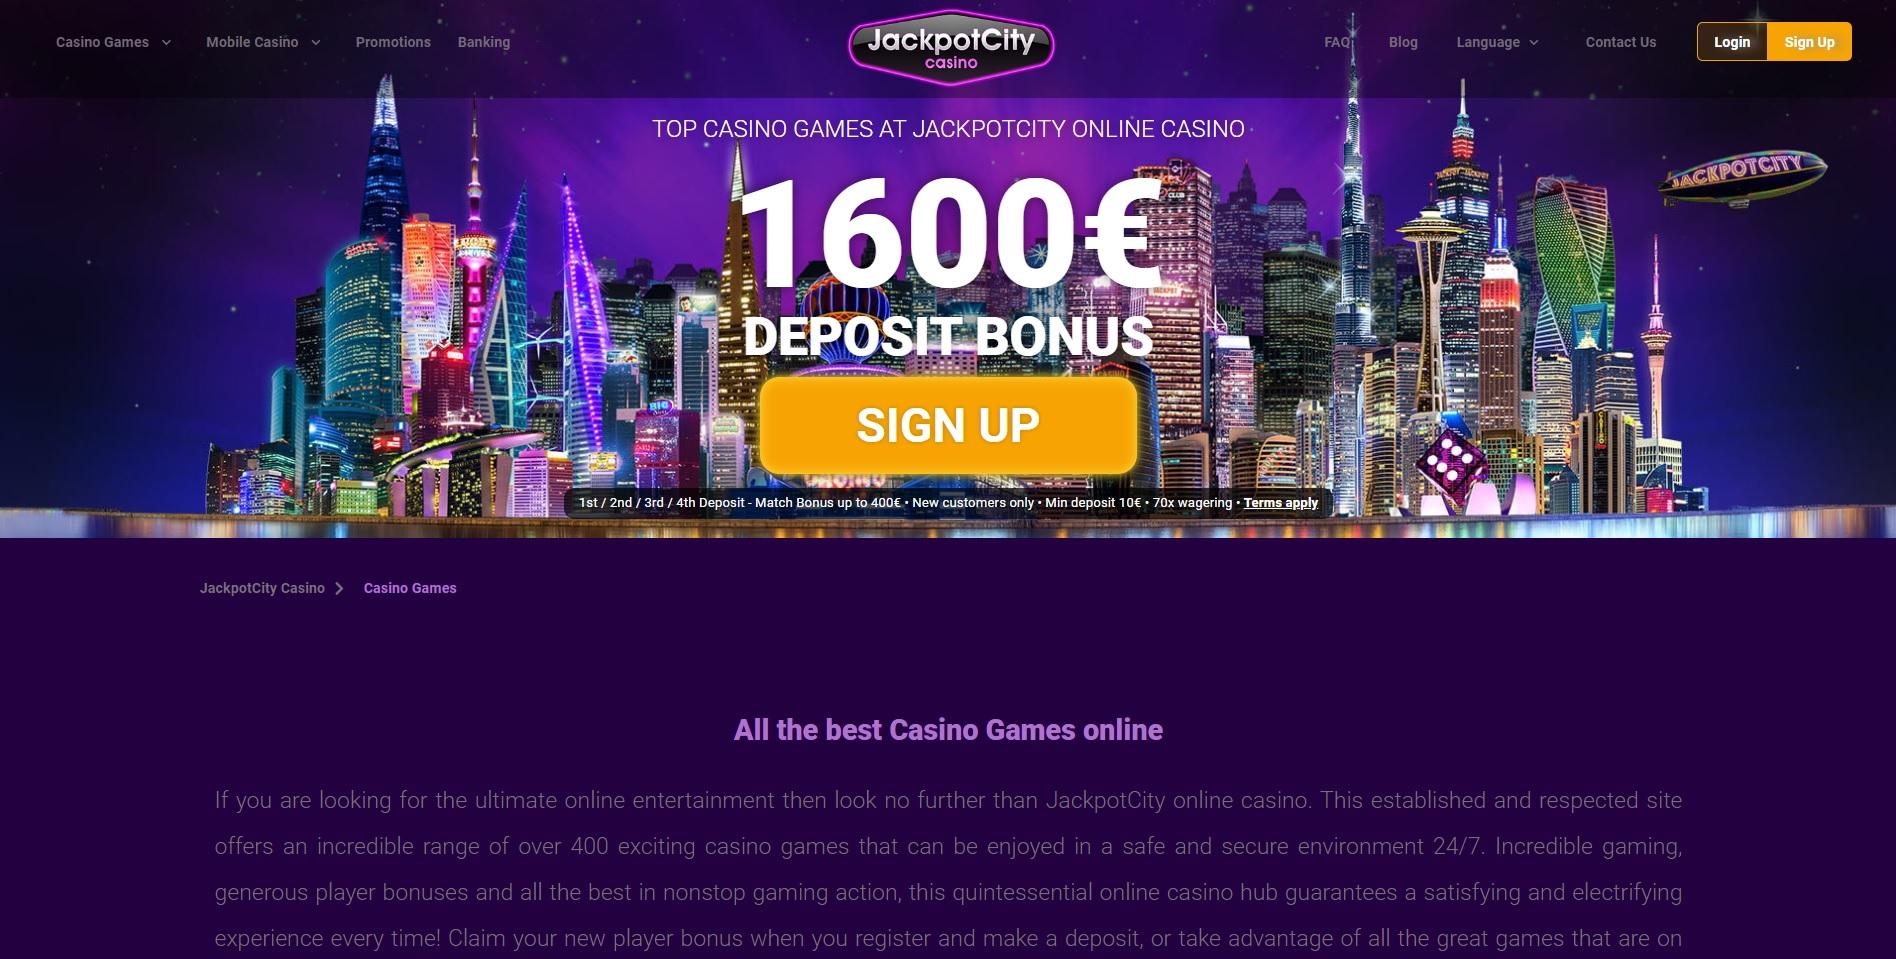 JackpotCasino Welcome Page